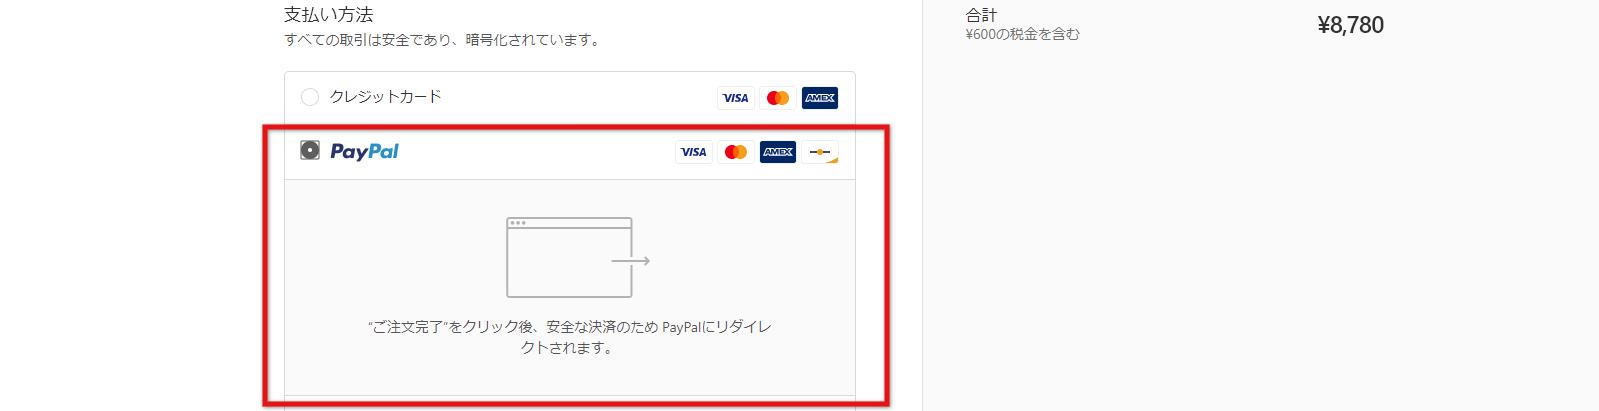 paypal - Manduka 日本公式サイト サイトリニューアルのお知らせ